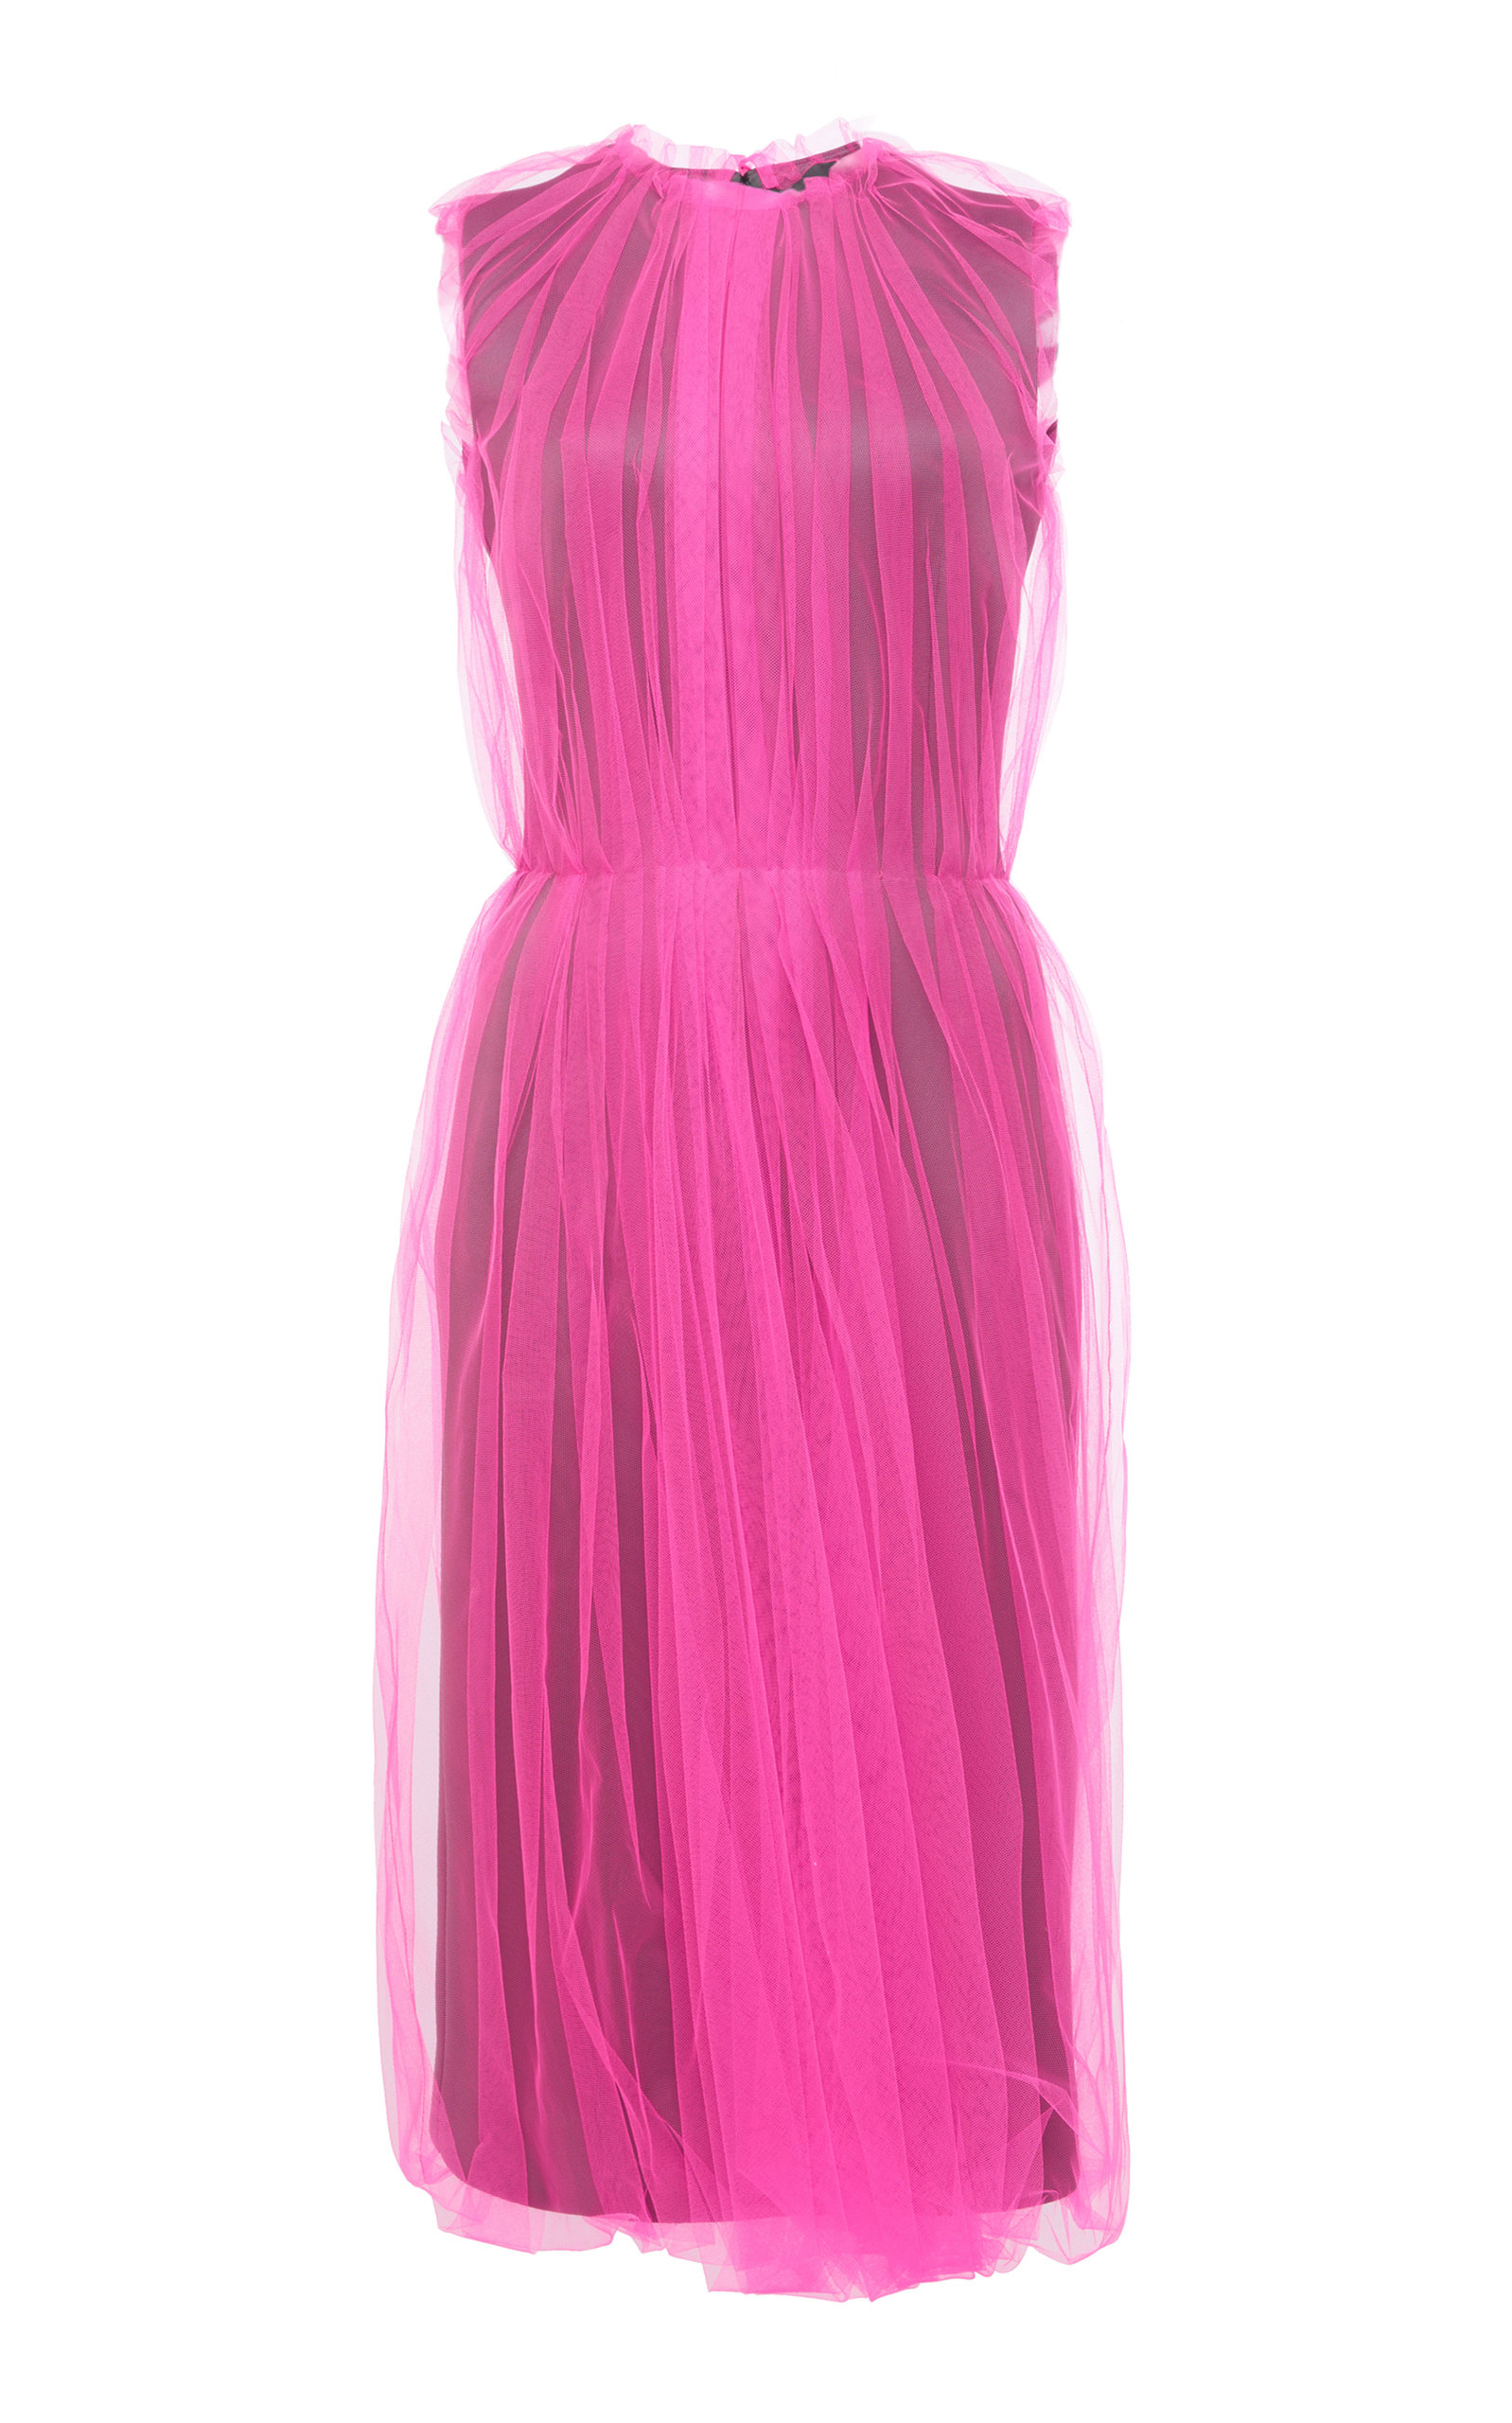 Gathered Dress Prada Original Buy Cheap High Quality Countdown Package Sale Online 7JGadsK